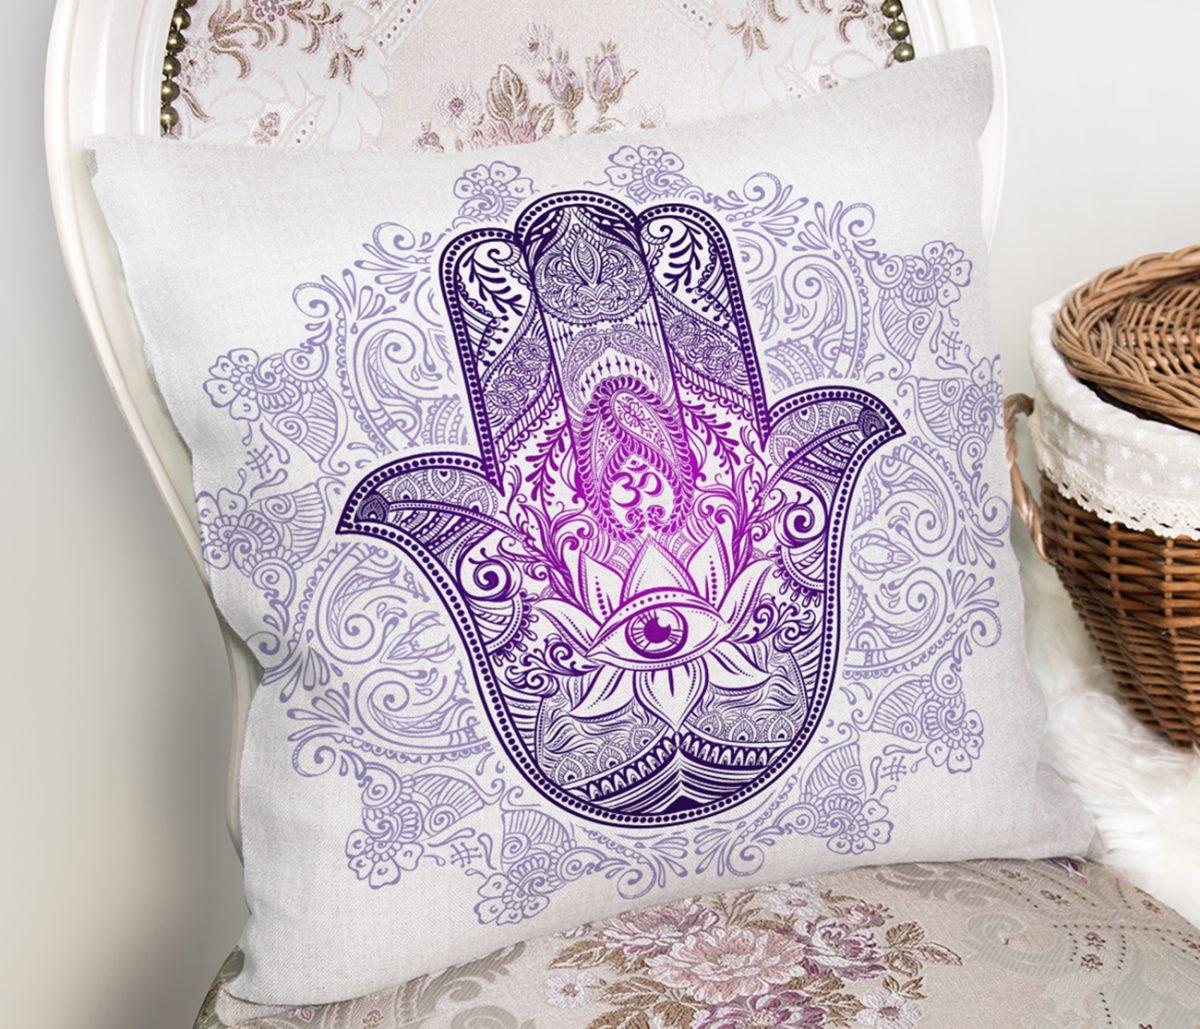 Mandala İçinde Fatma'nın Bereket Eli Motifli Kırlent Kılıfı Realhomes